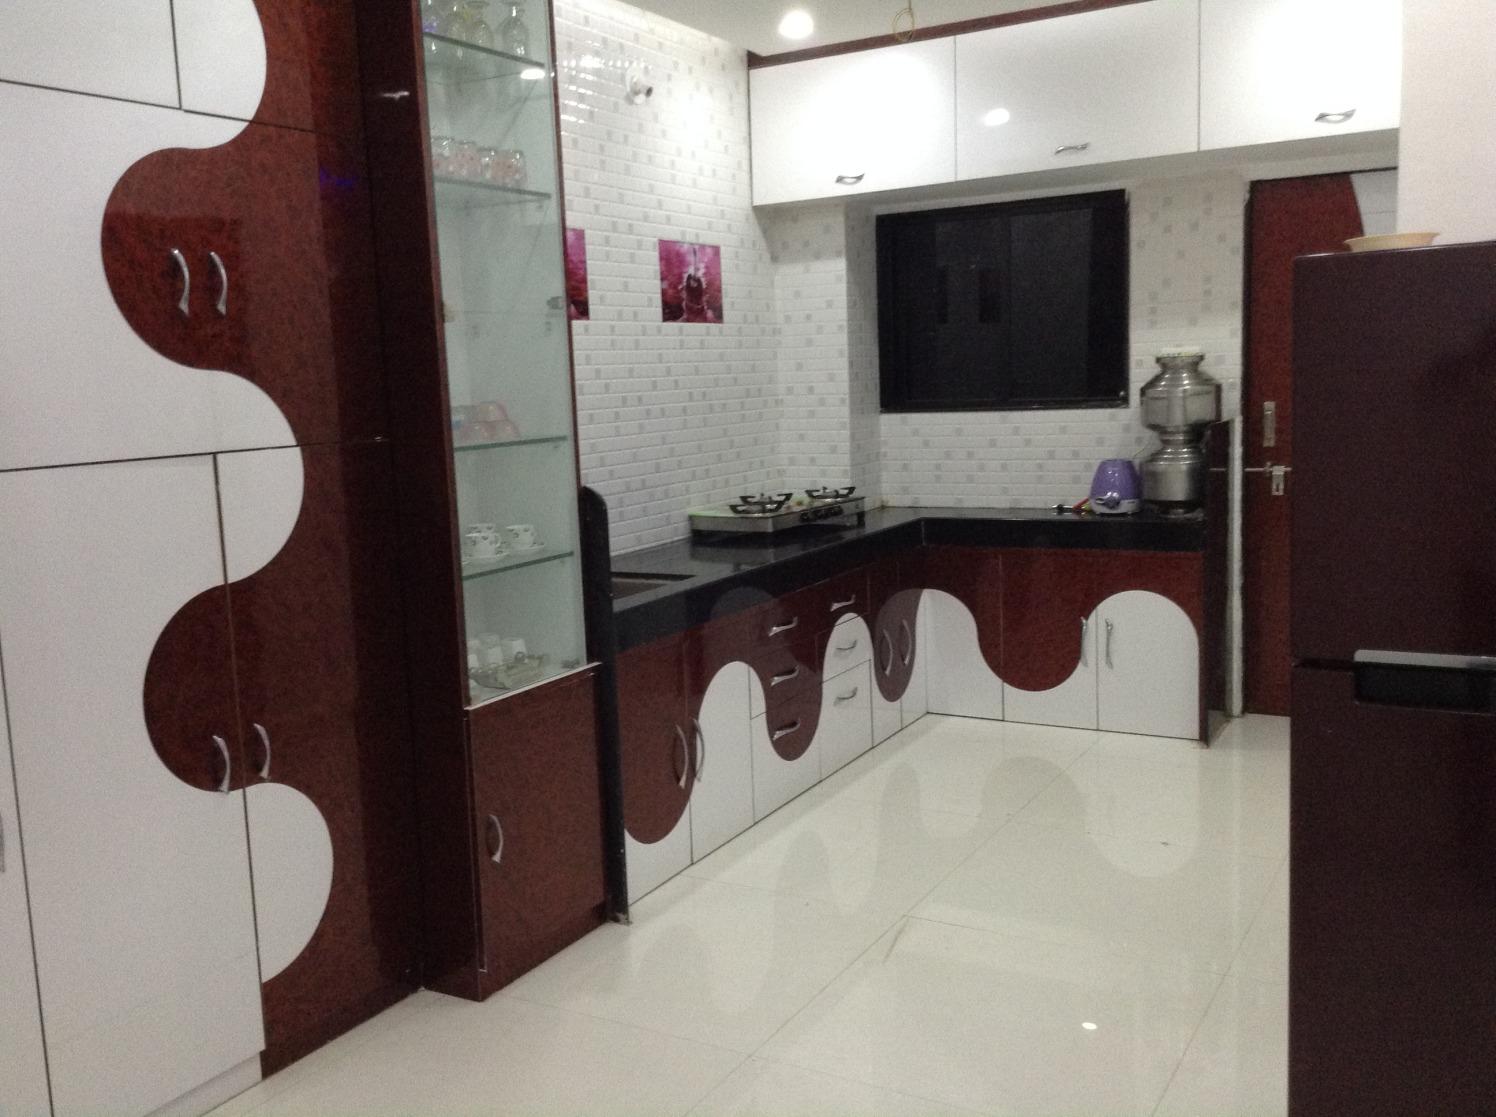 Curvy Flow by Siddhant Ashtekar Modular-kitchen Contemporary | Interior Design Photos & Ideas